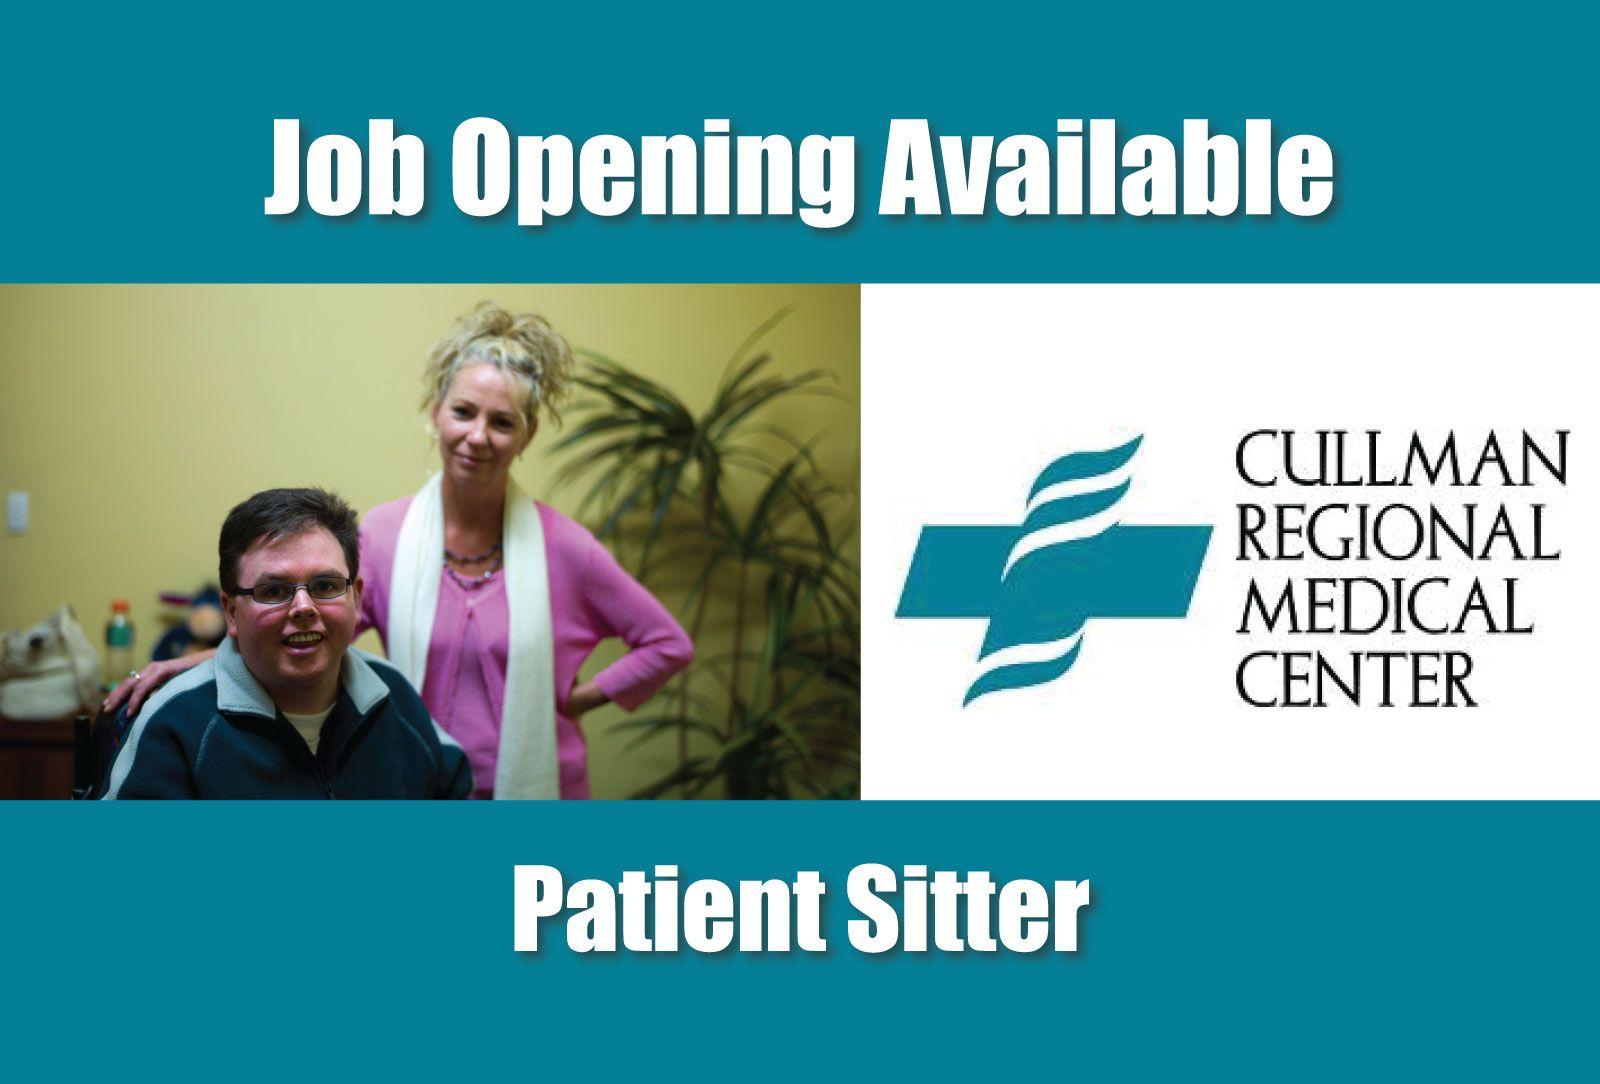 JOB AVAILABLE: PATIENT SITTER Employer: Cullman Regional Medical Center  Shift: Rotating JOB SUMMARY